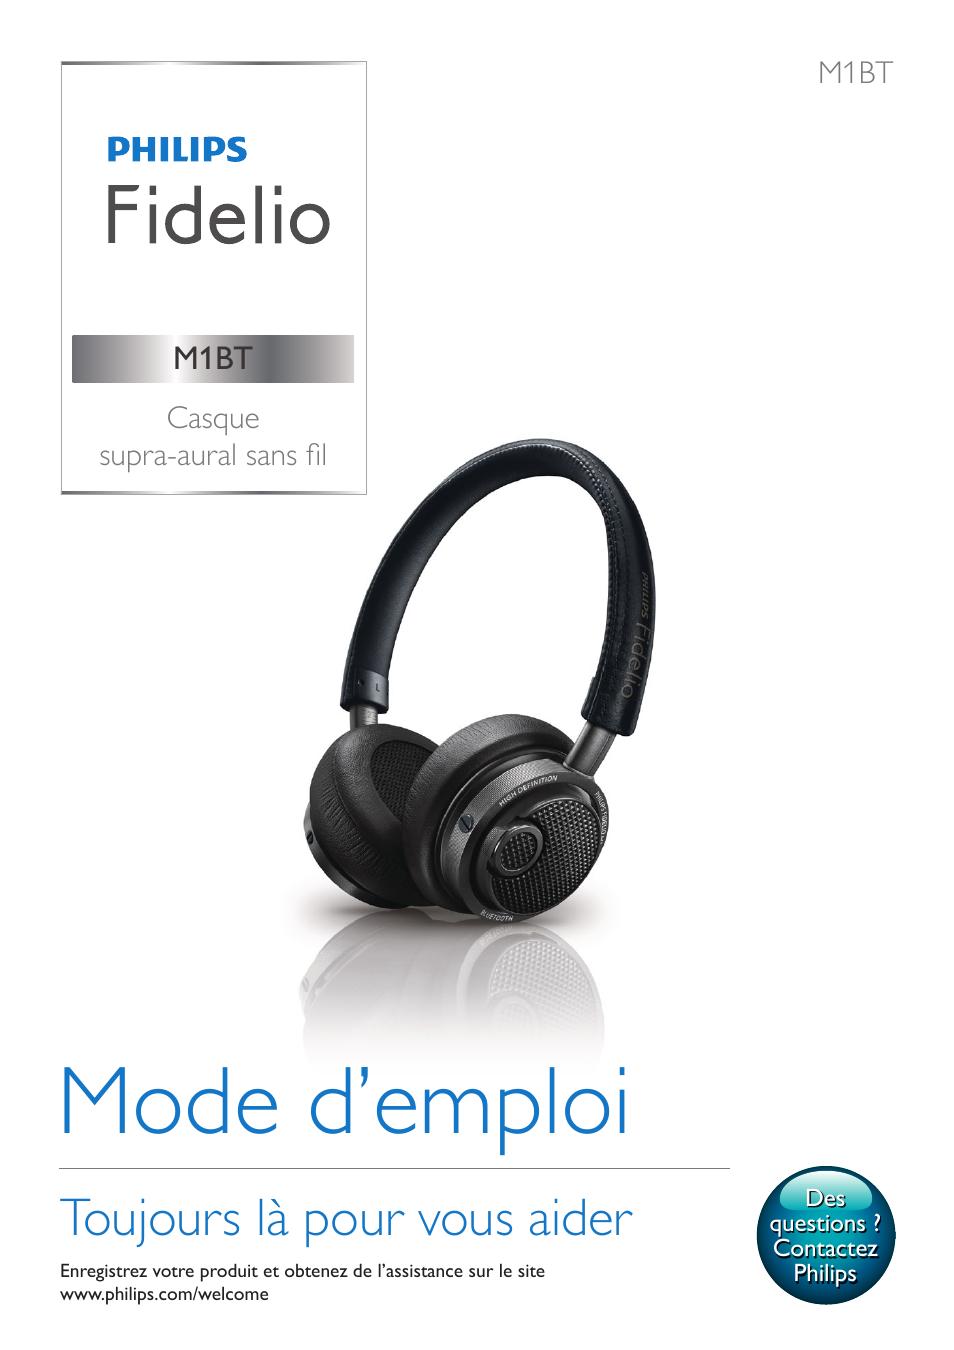 Philips Fidelio Casque Bluetooth Manuel Dutilisation Pages 16